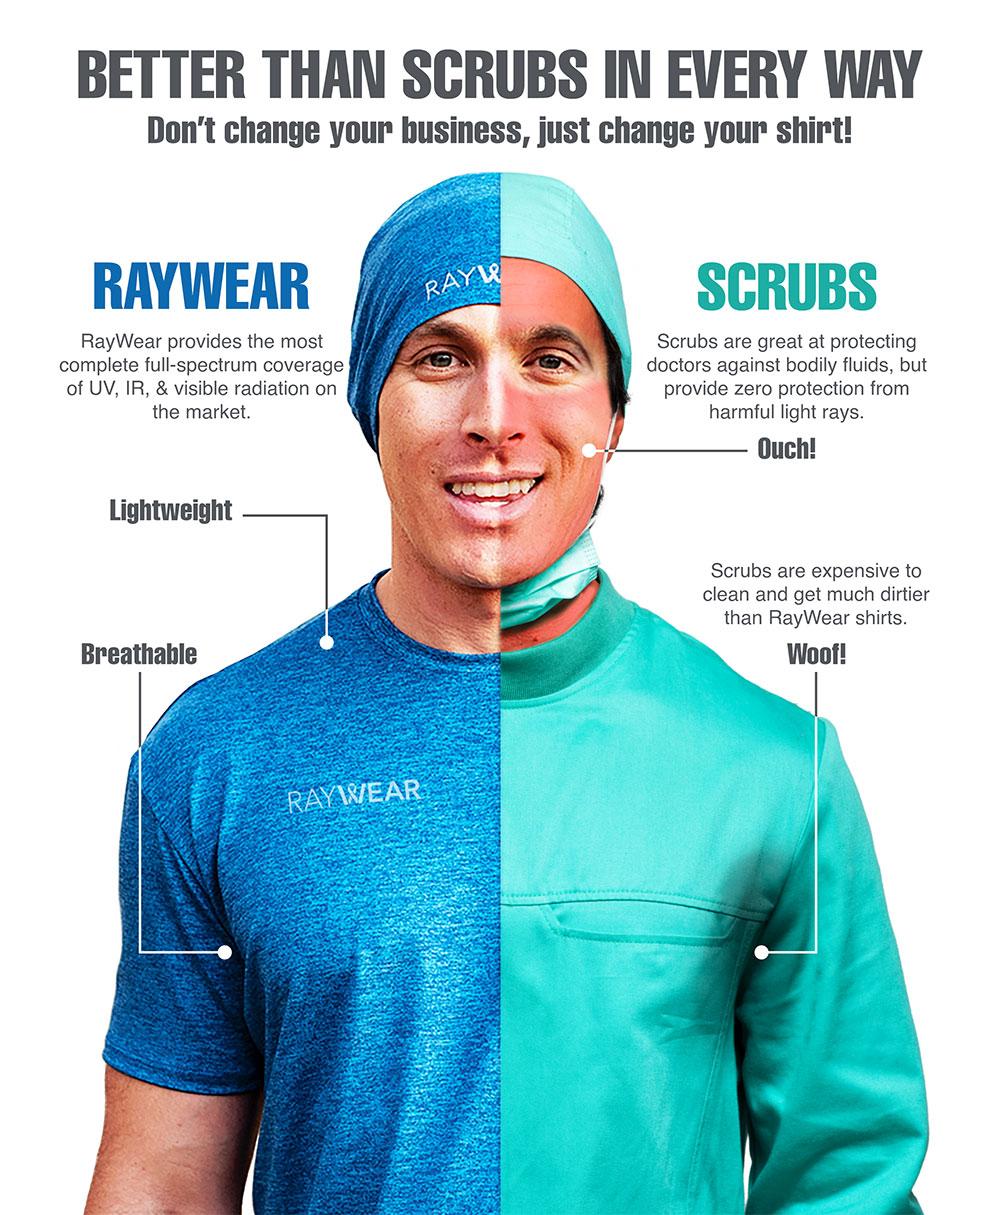 RayWear vs Scrubs